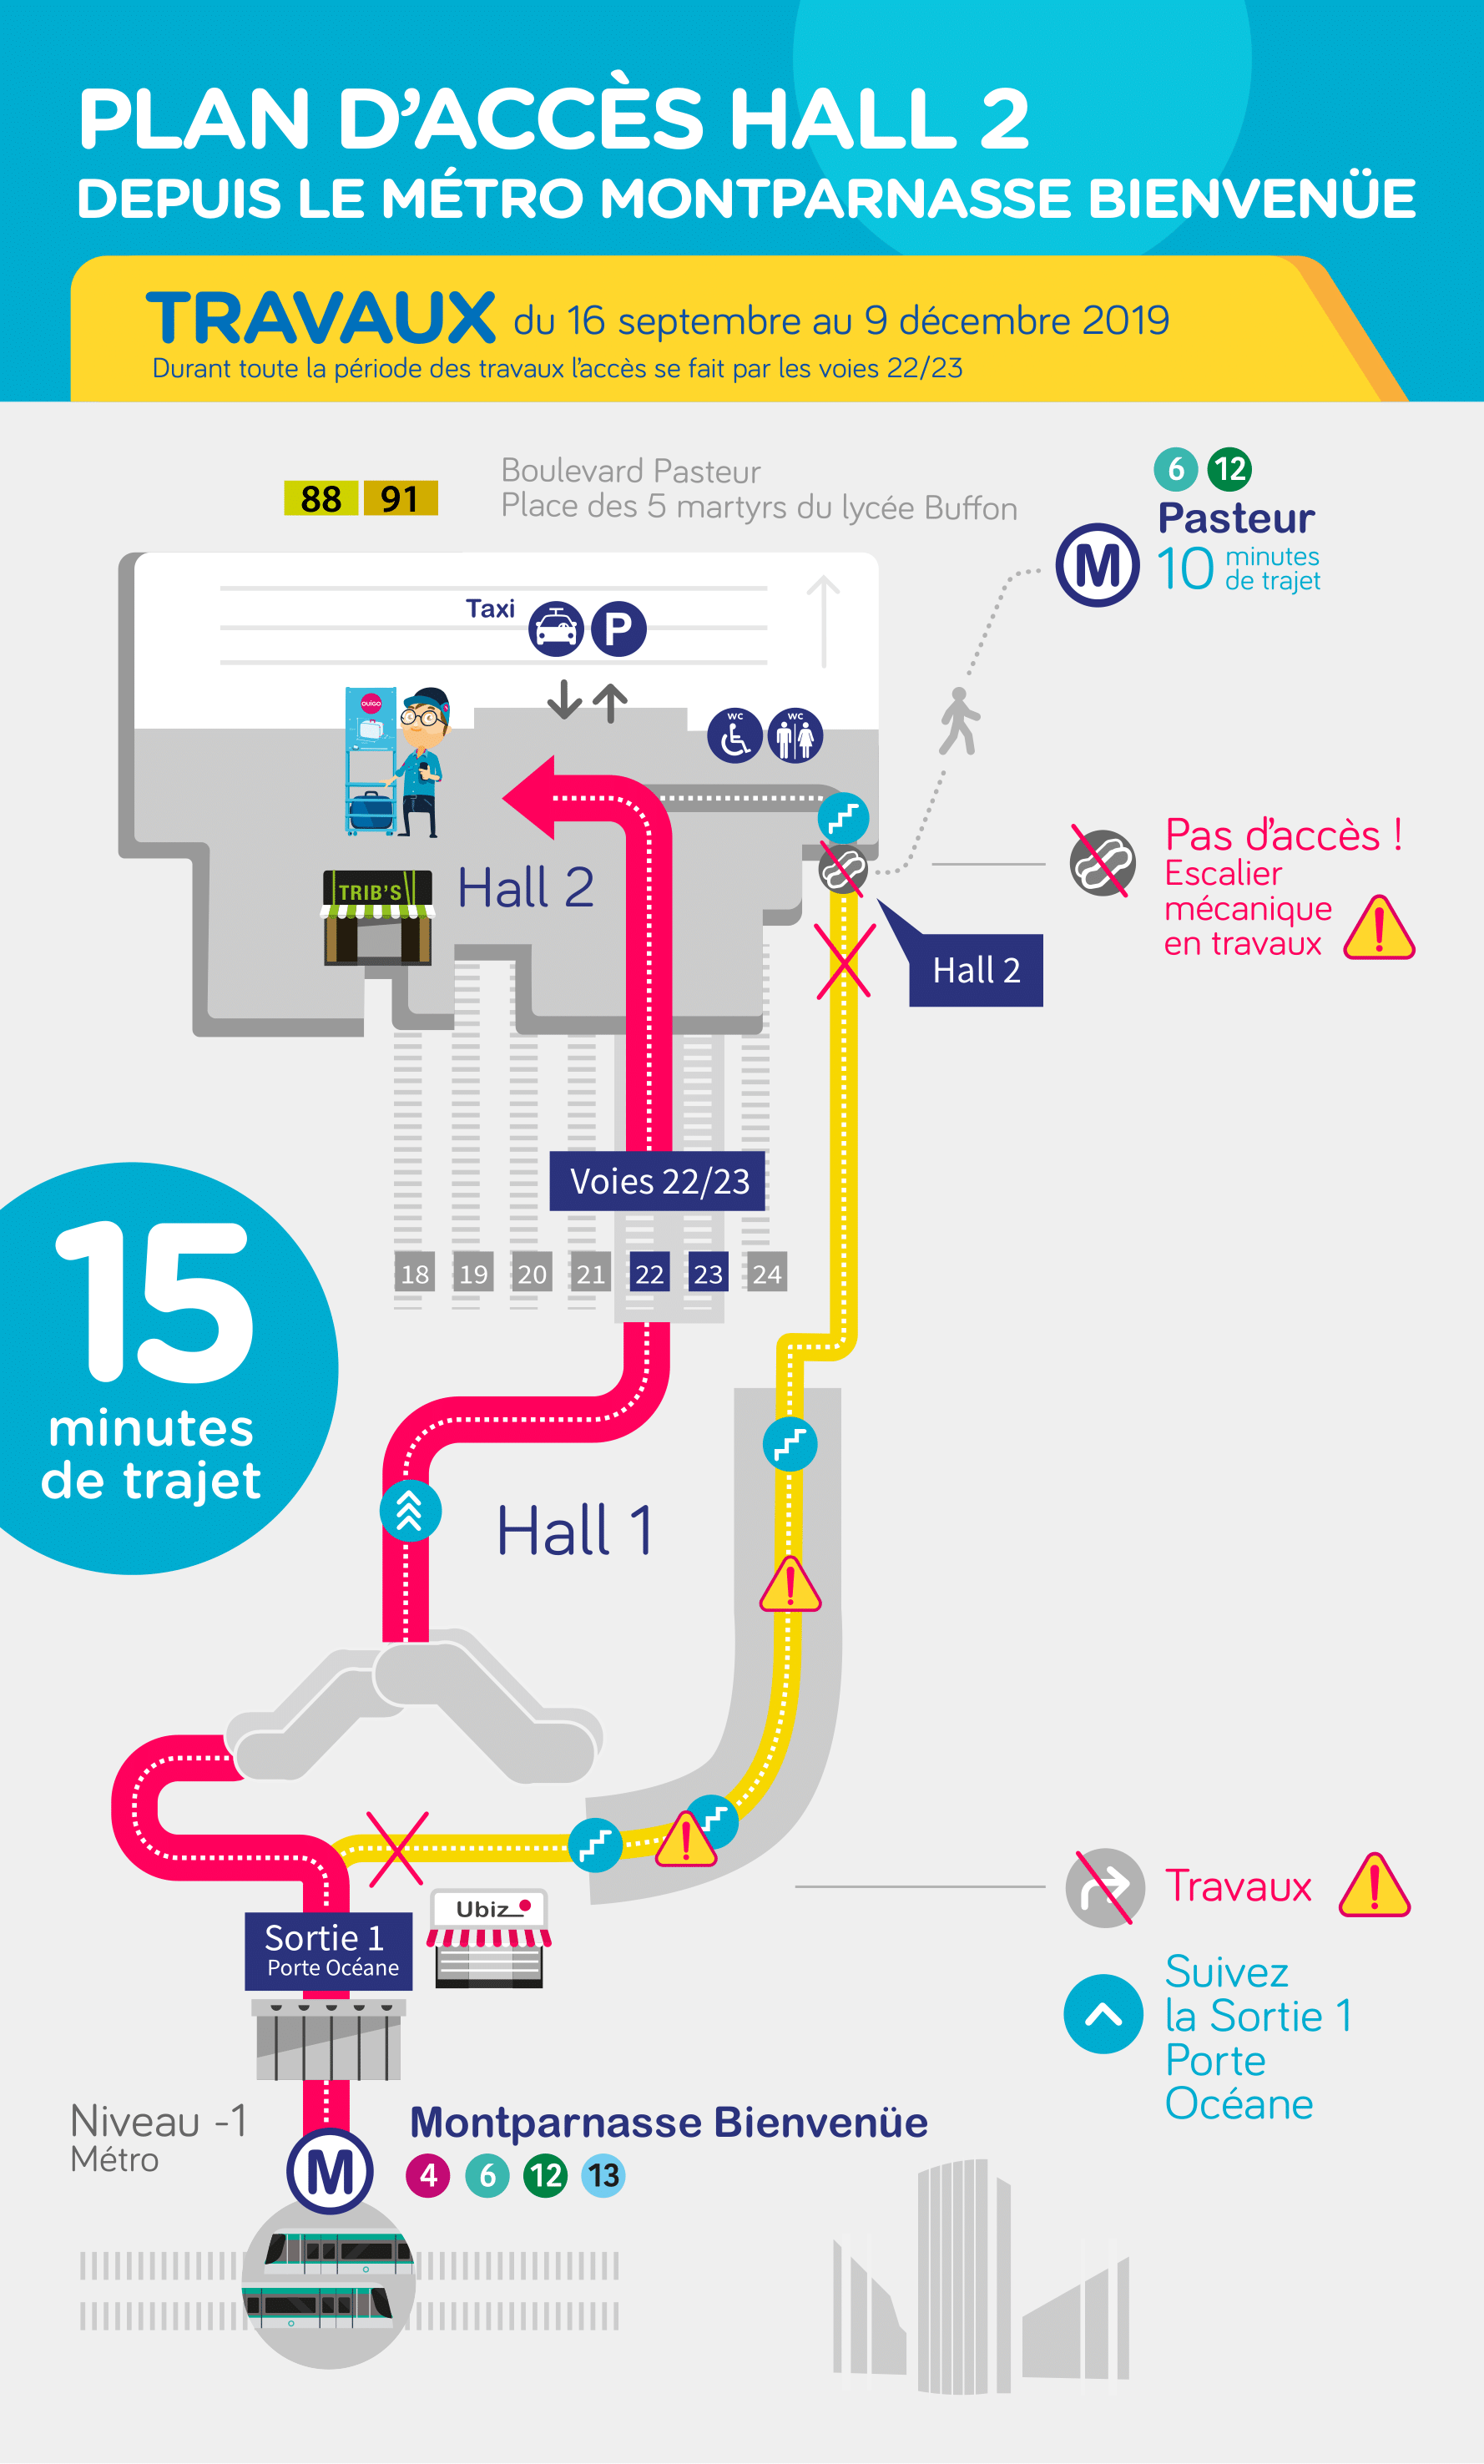 Gare Sncf De Paris Montparnasse Acces Parking Horaires Ouigo